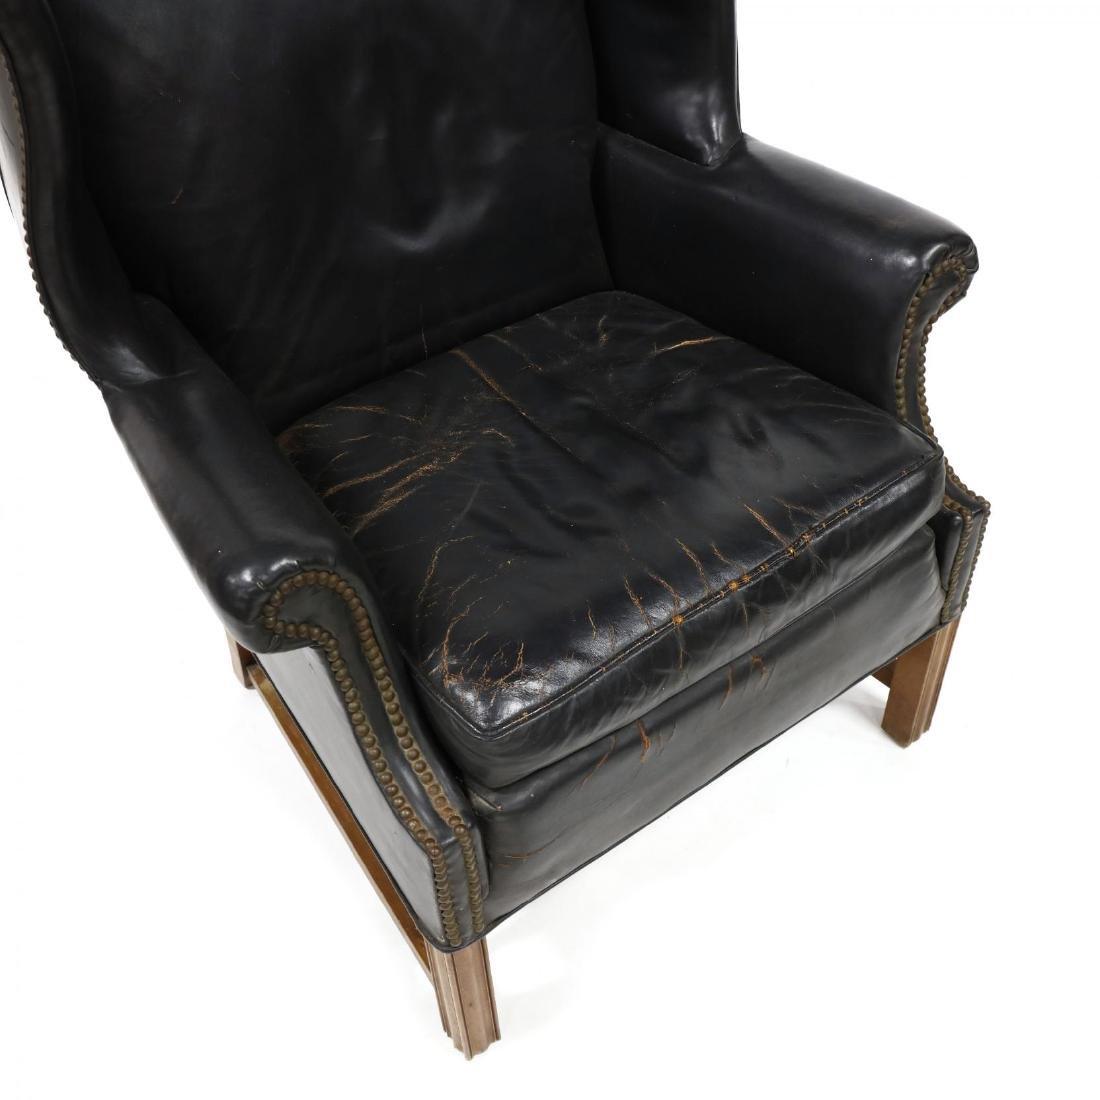 Century Furniture, Vintage Leather Upholstered - 2